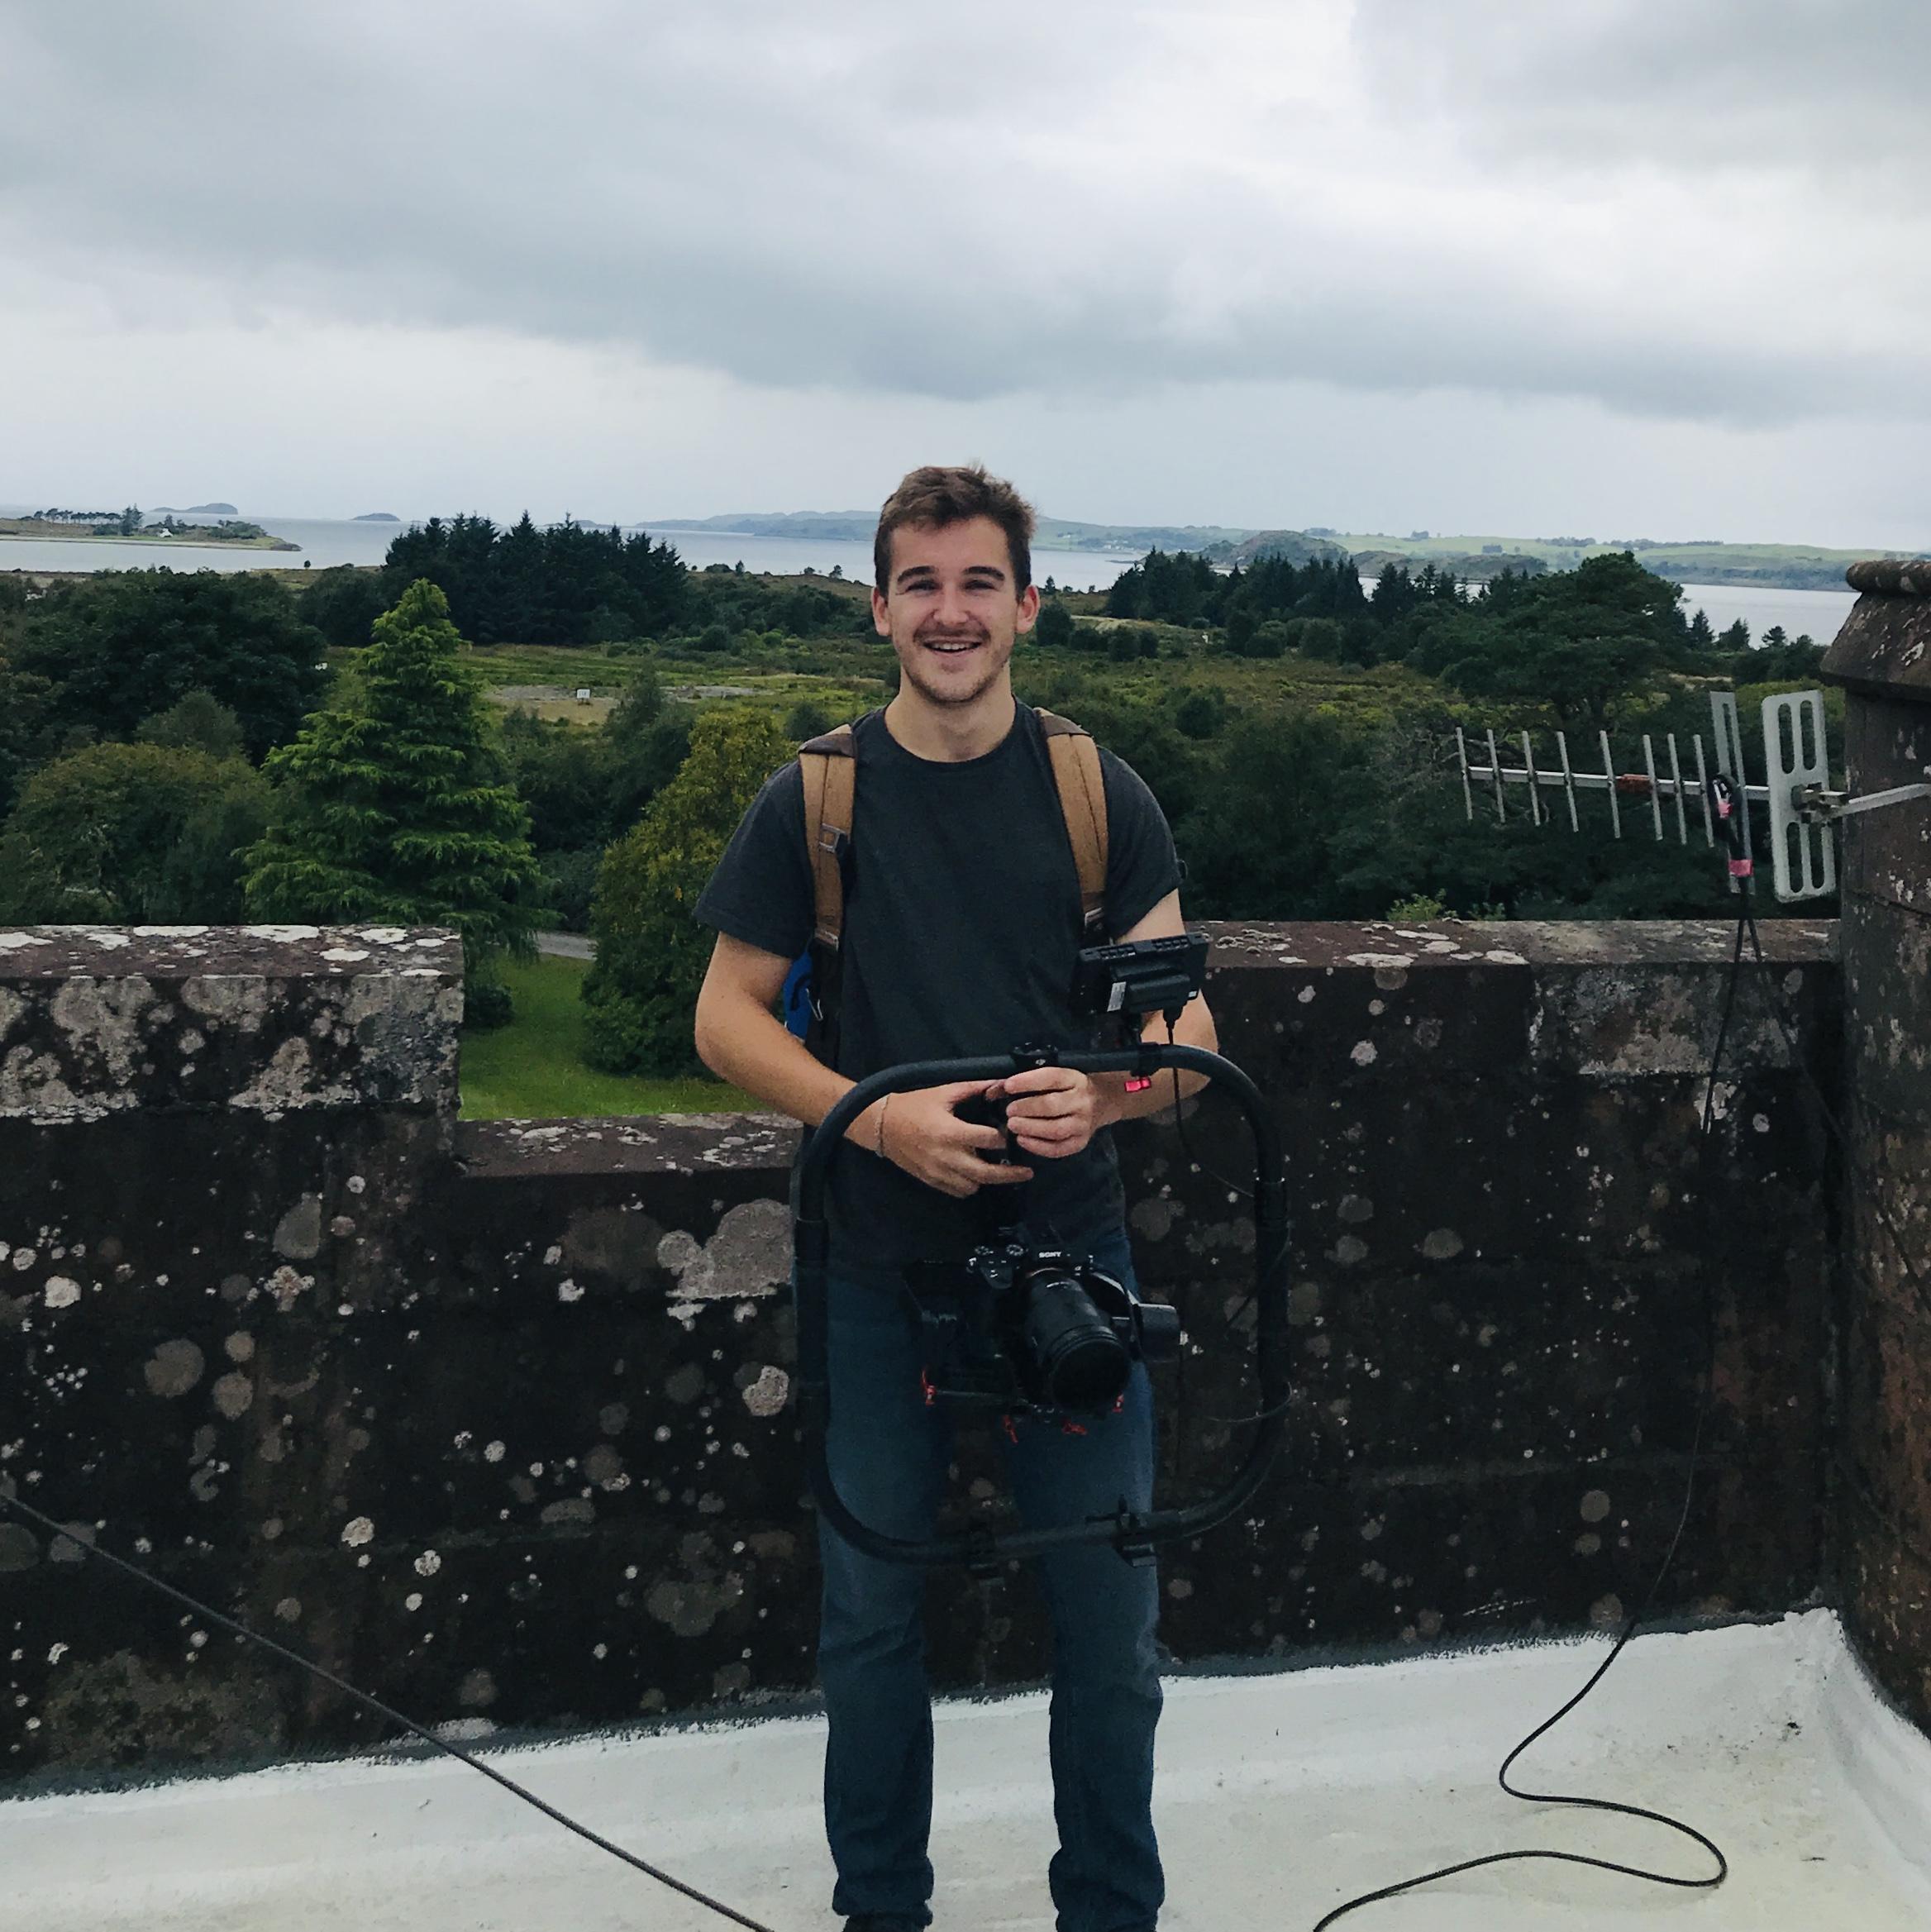 Rooftop filming!